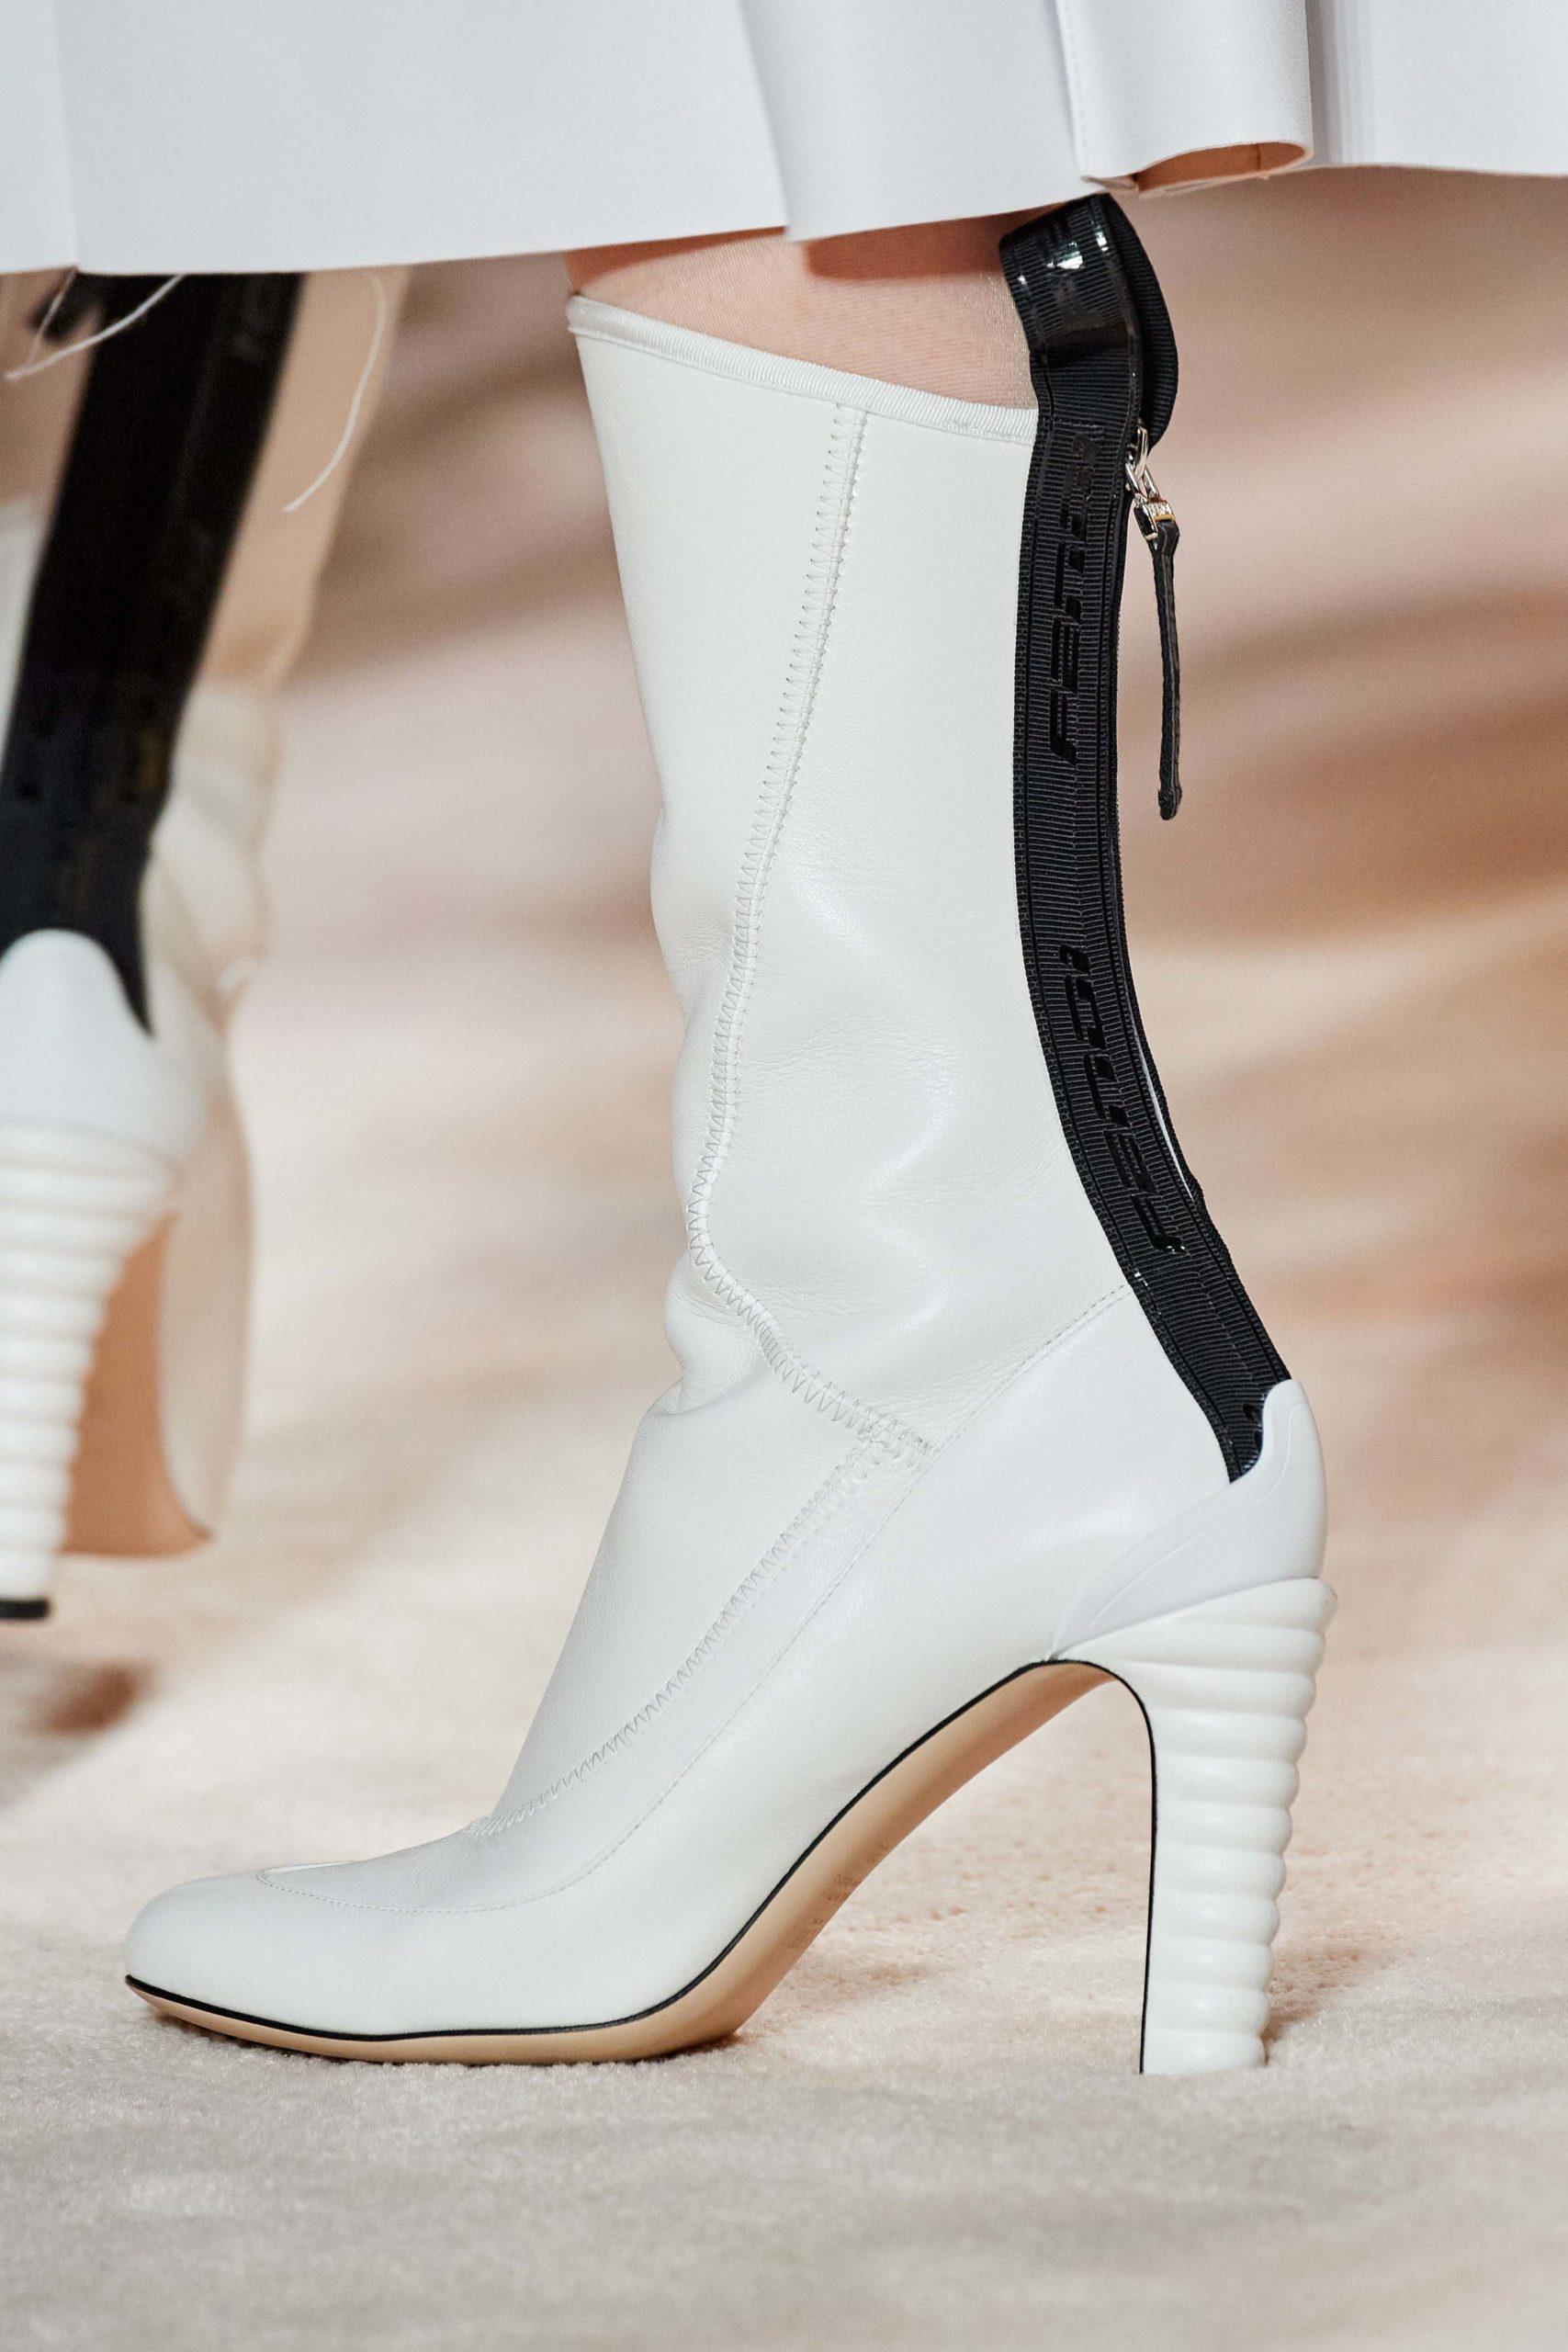 Fendi Fall 2020 trends runway report Ready To Wear Vogue fendi boots